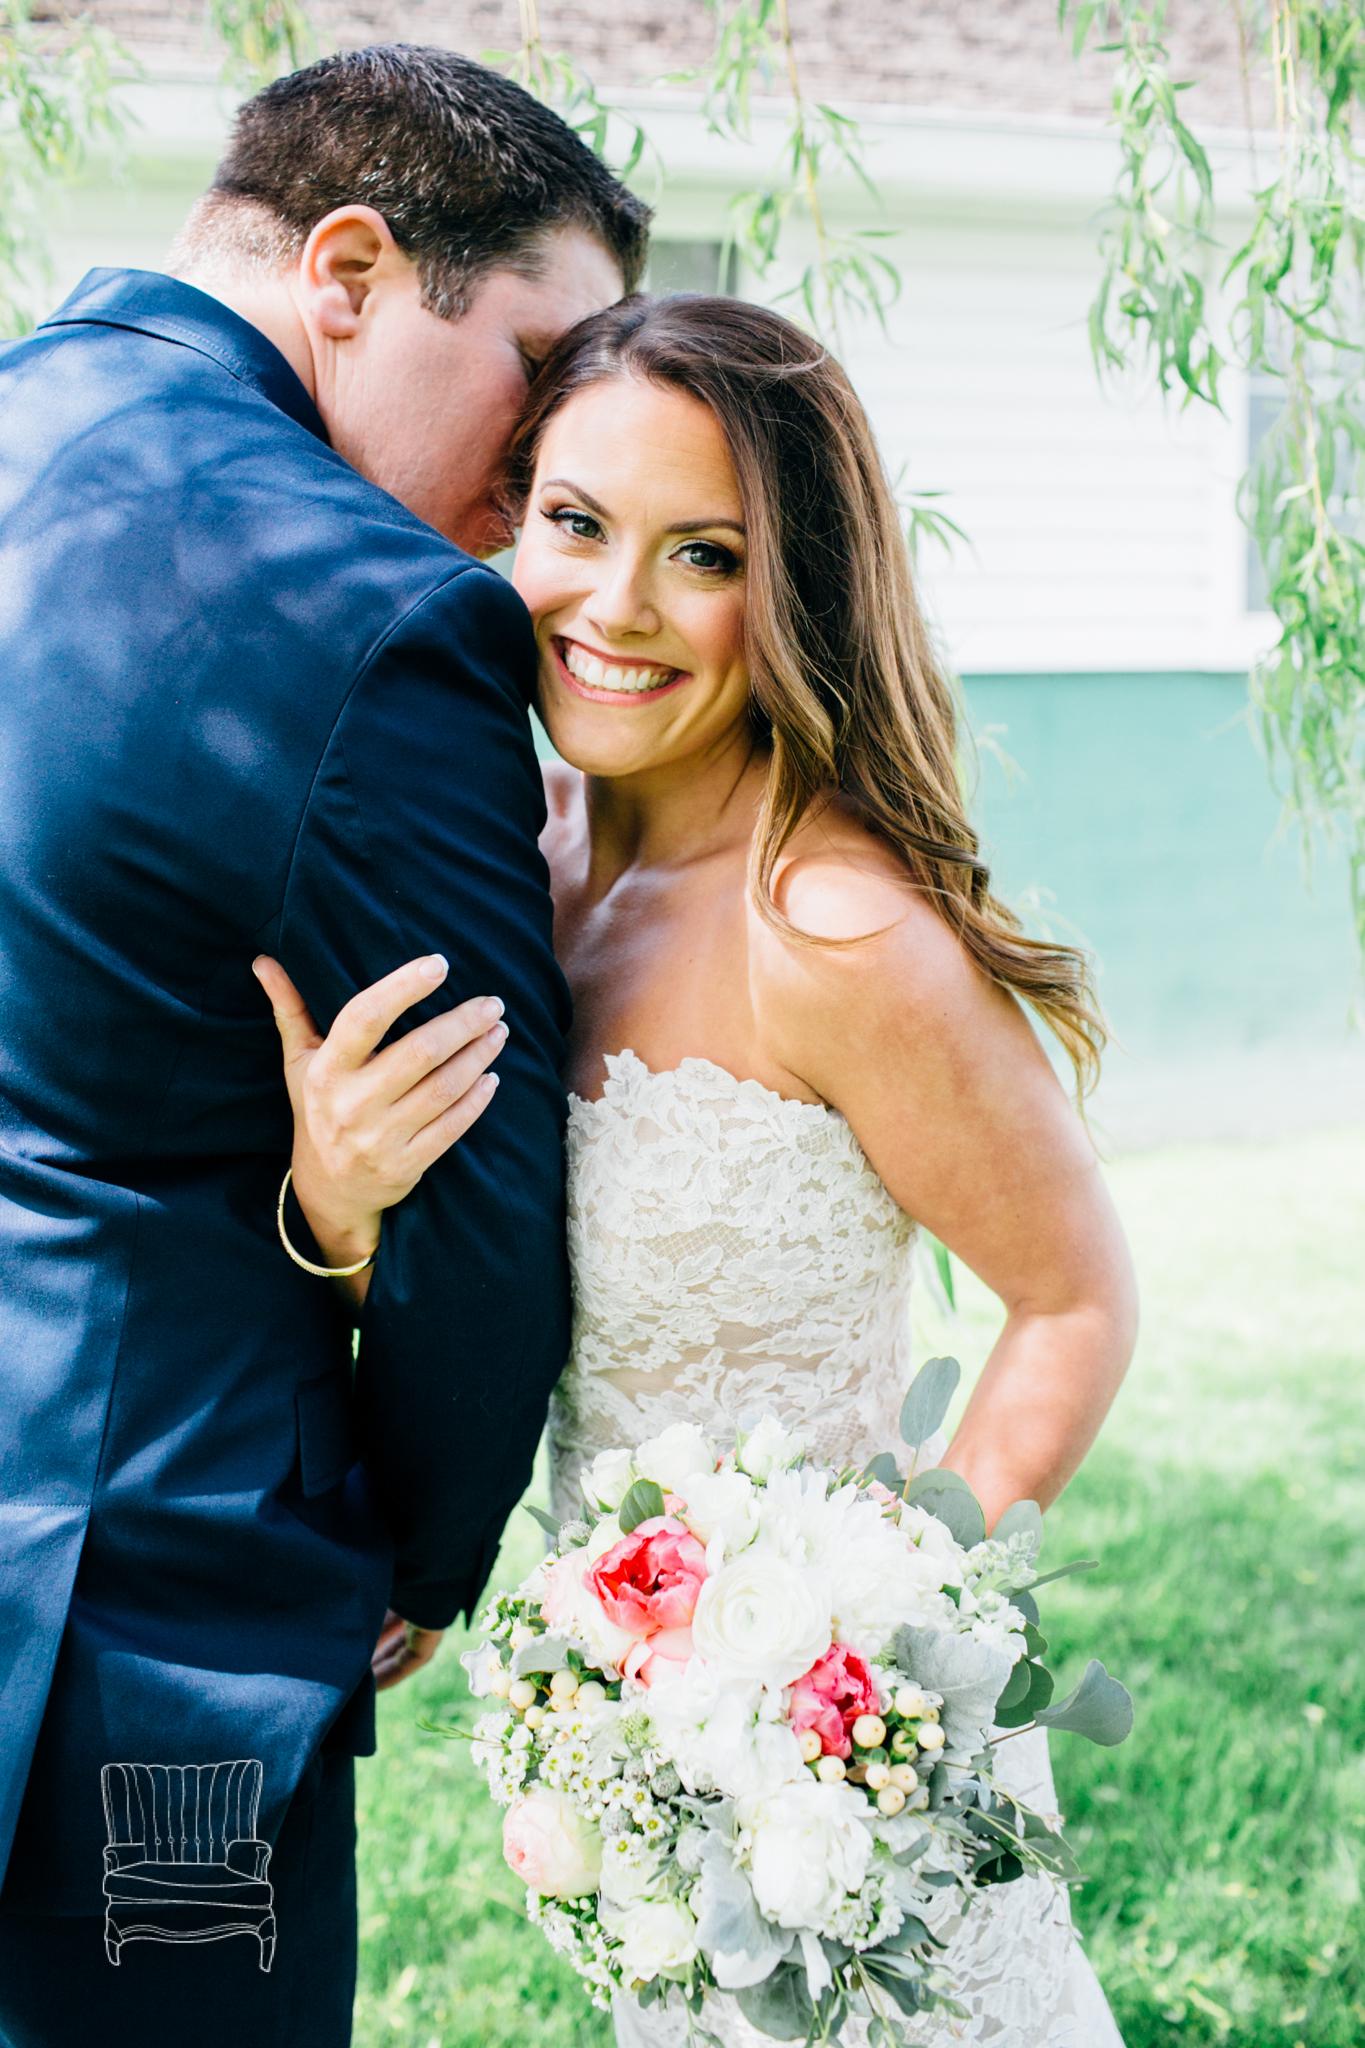 seattle-wedding-photographer-katheryn-moran-russells-bothell-wilkins-wedding-photo-19.jpg